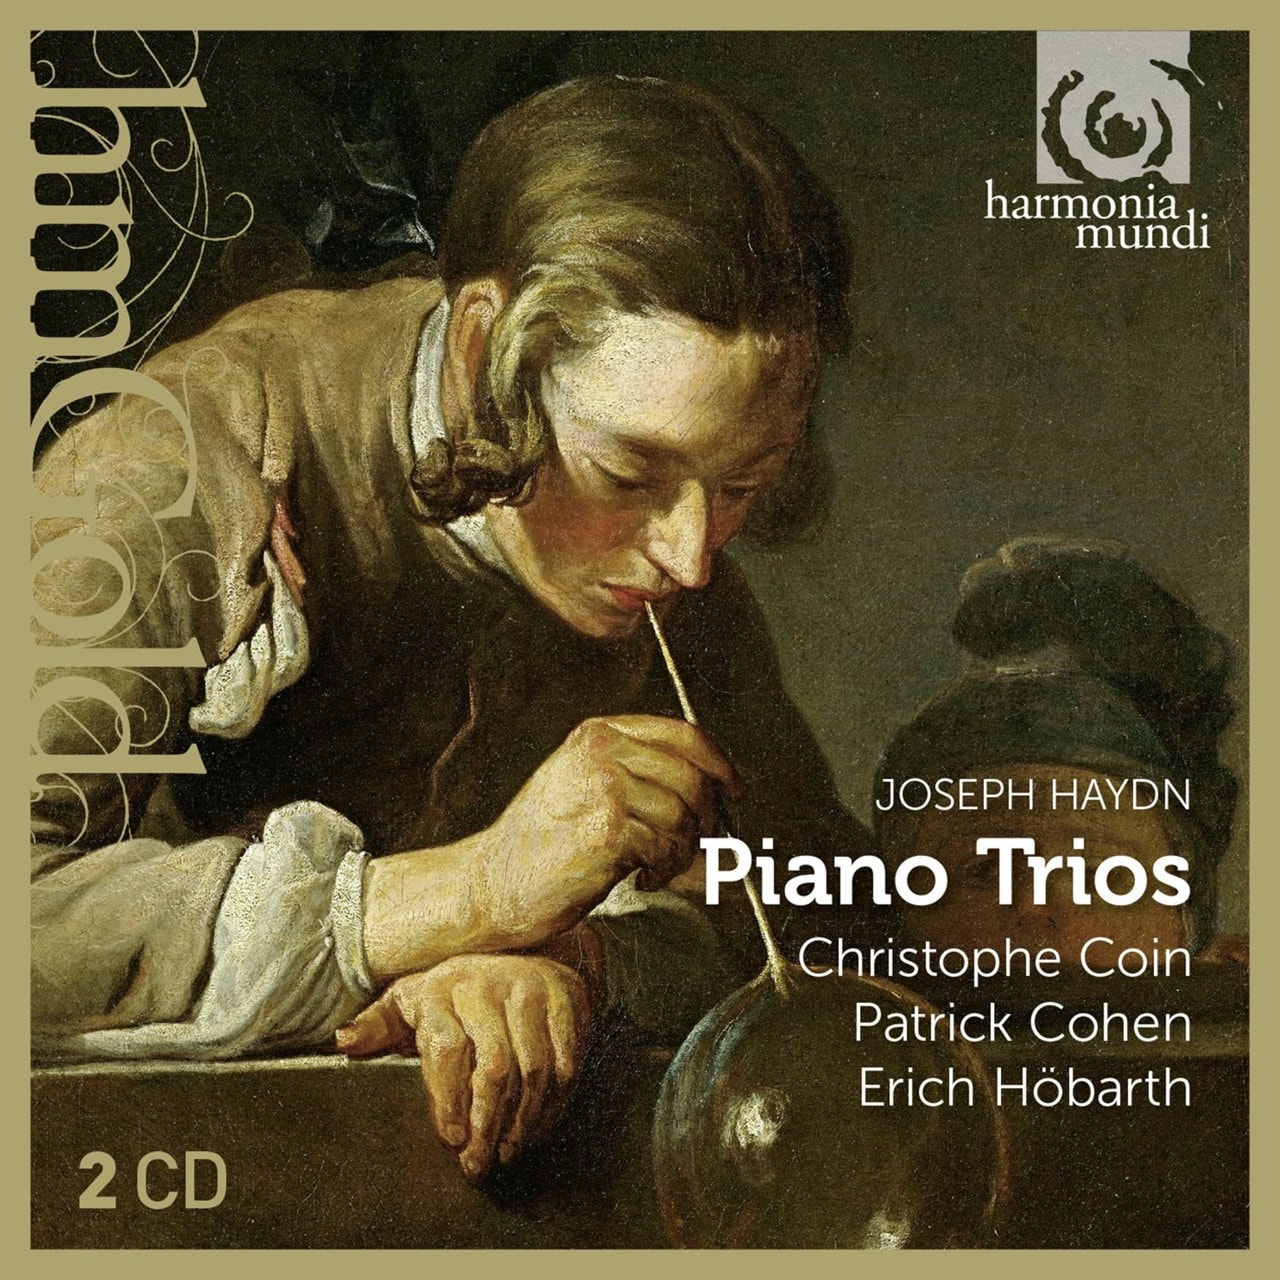 Joseph Haydn: Piano Trios - 1